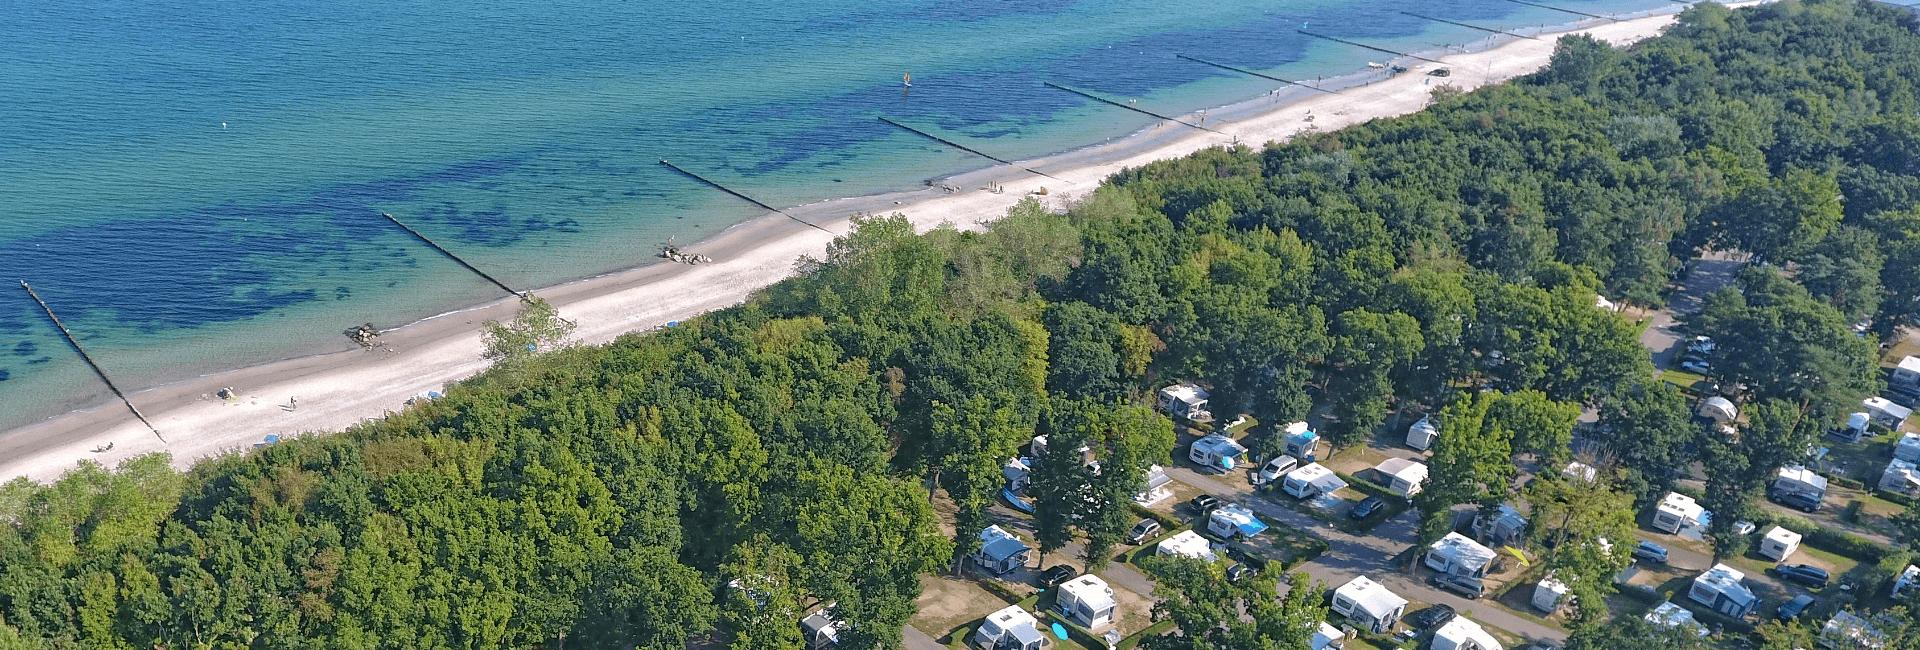 Camping Kuhlungsborn Auf Dem Luxus Campingplatz Ostsee Fur Familien